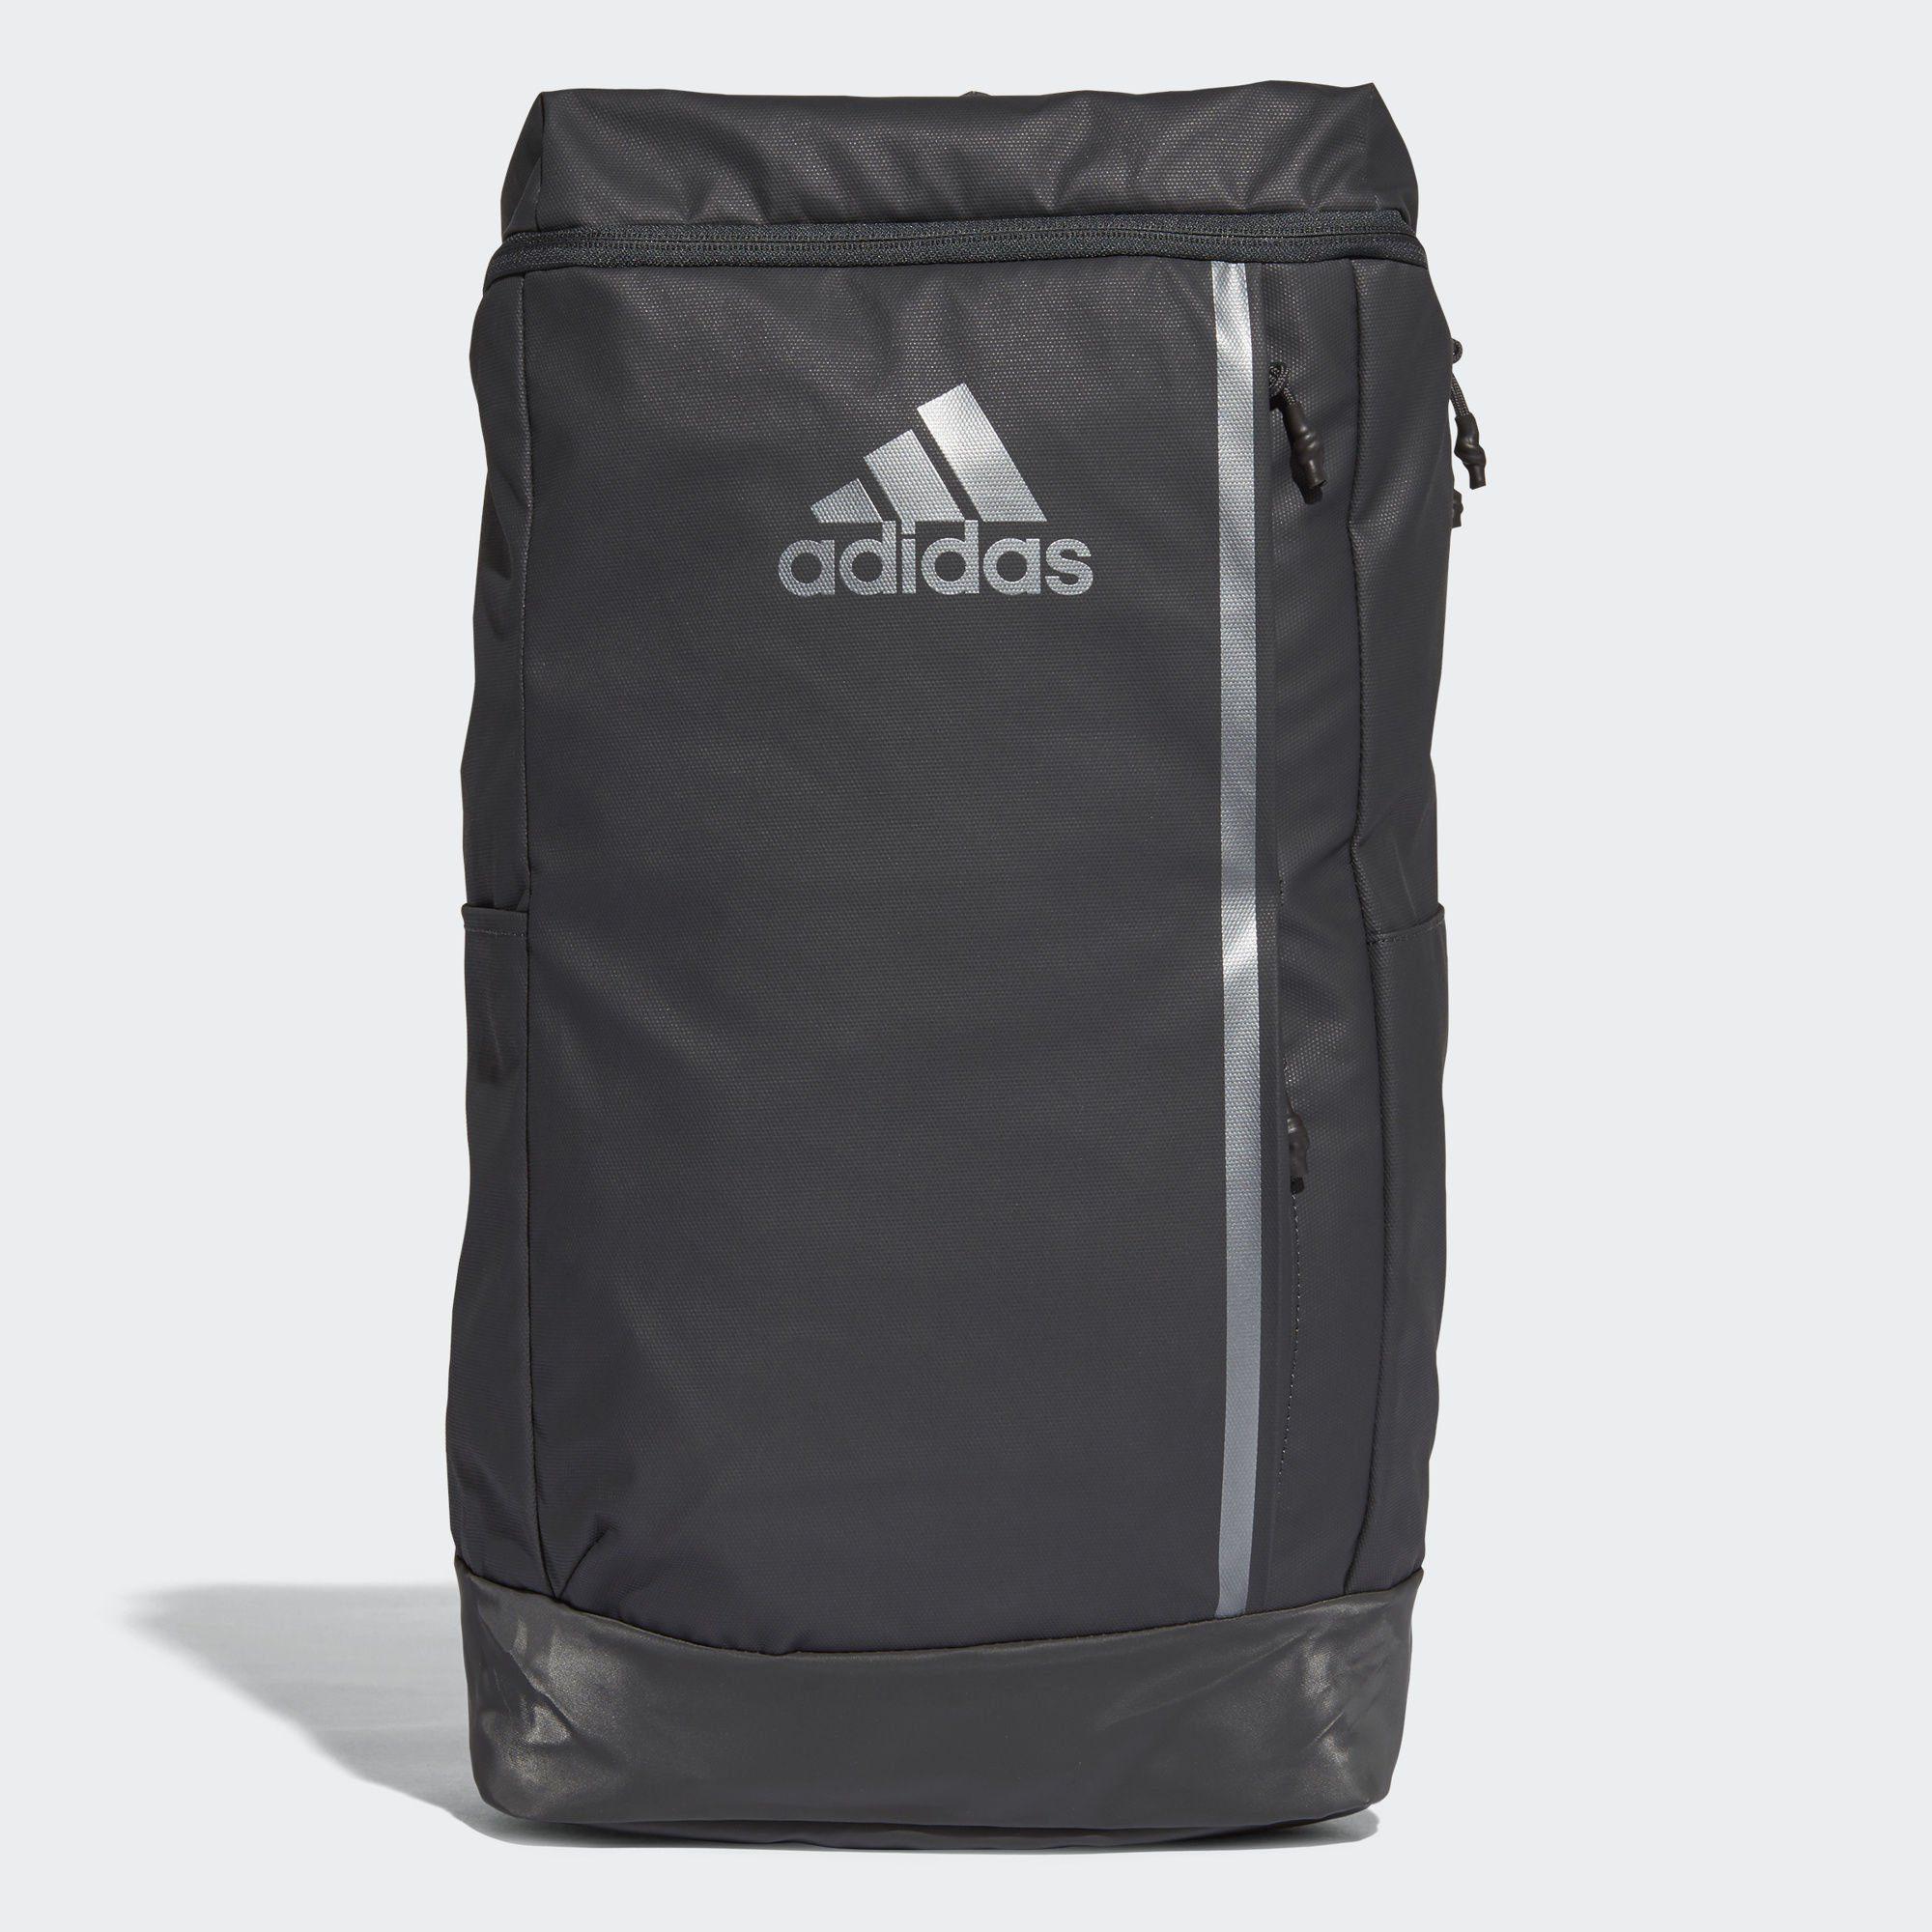 adidas Performance Sportrucksack »Training Rucksack«